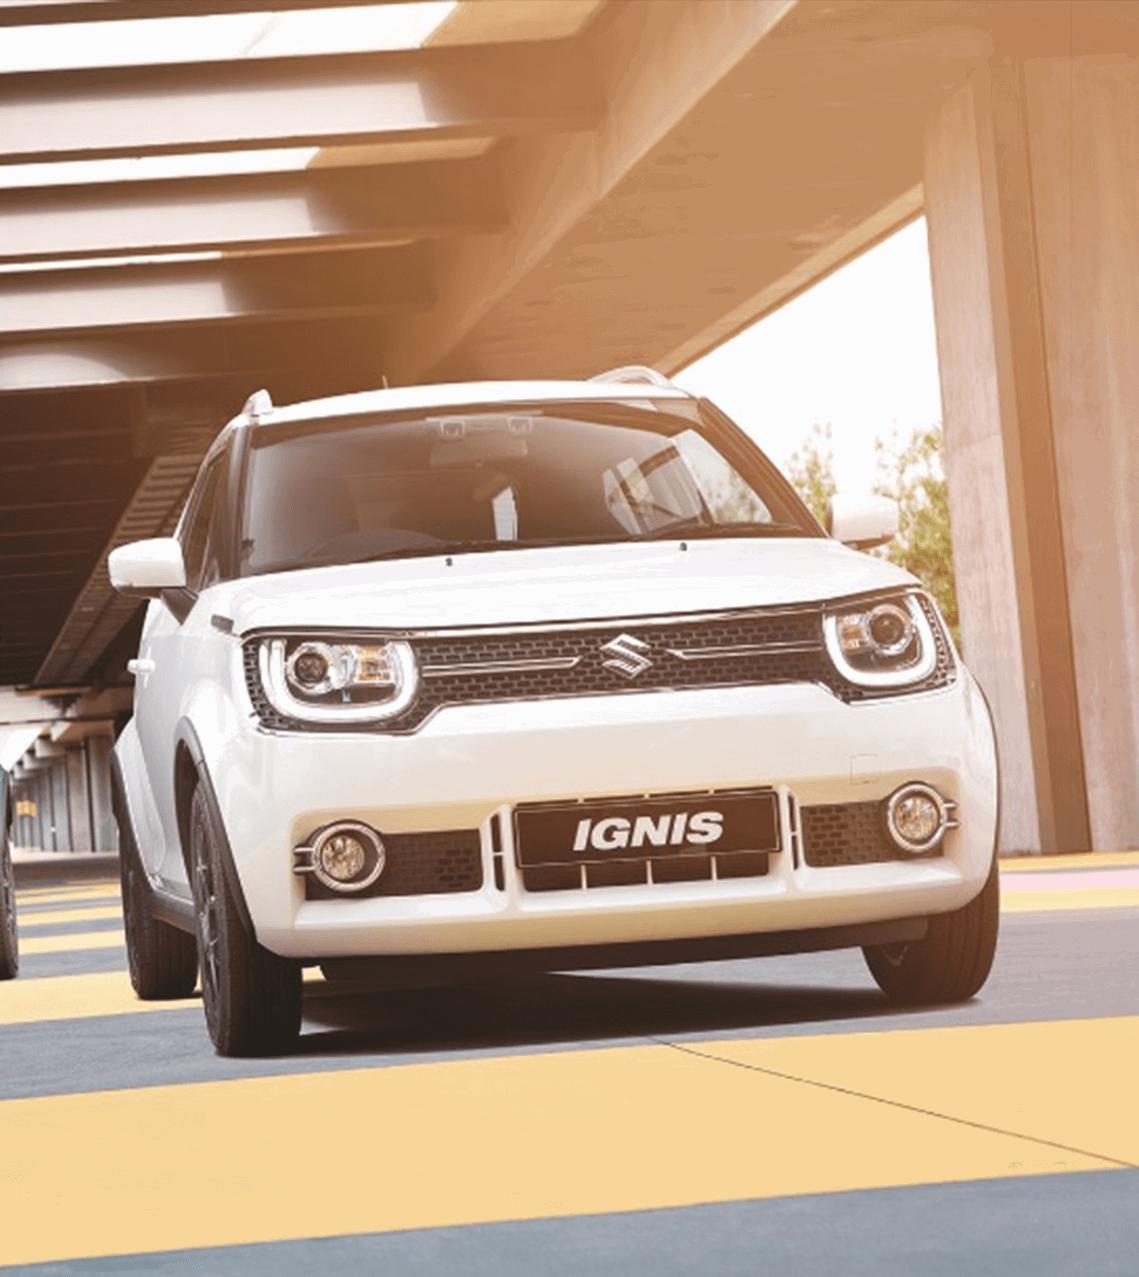 White Suzuki Ignis on the road